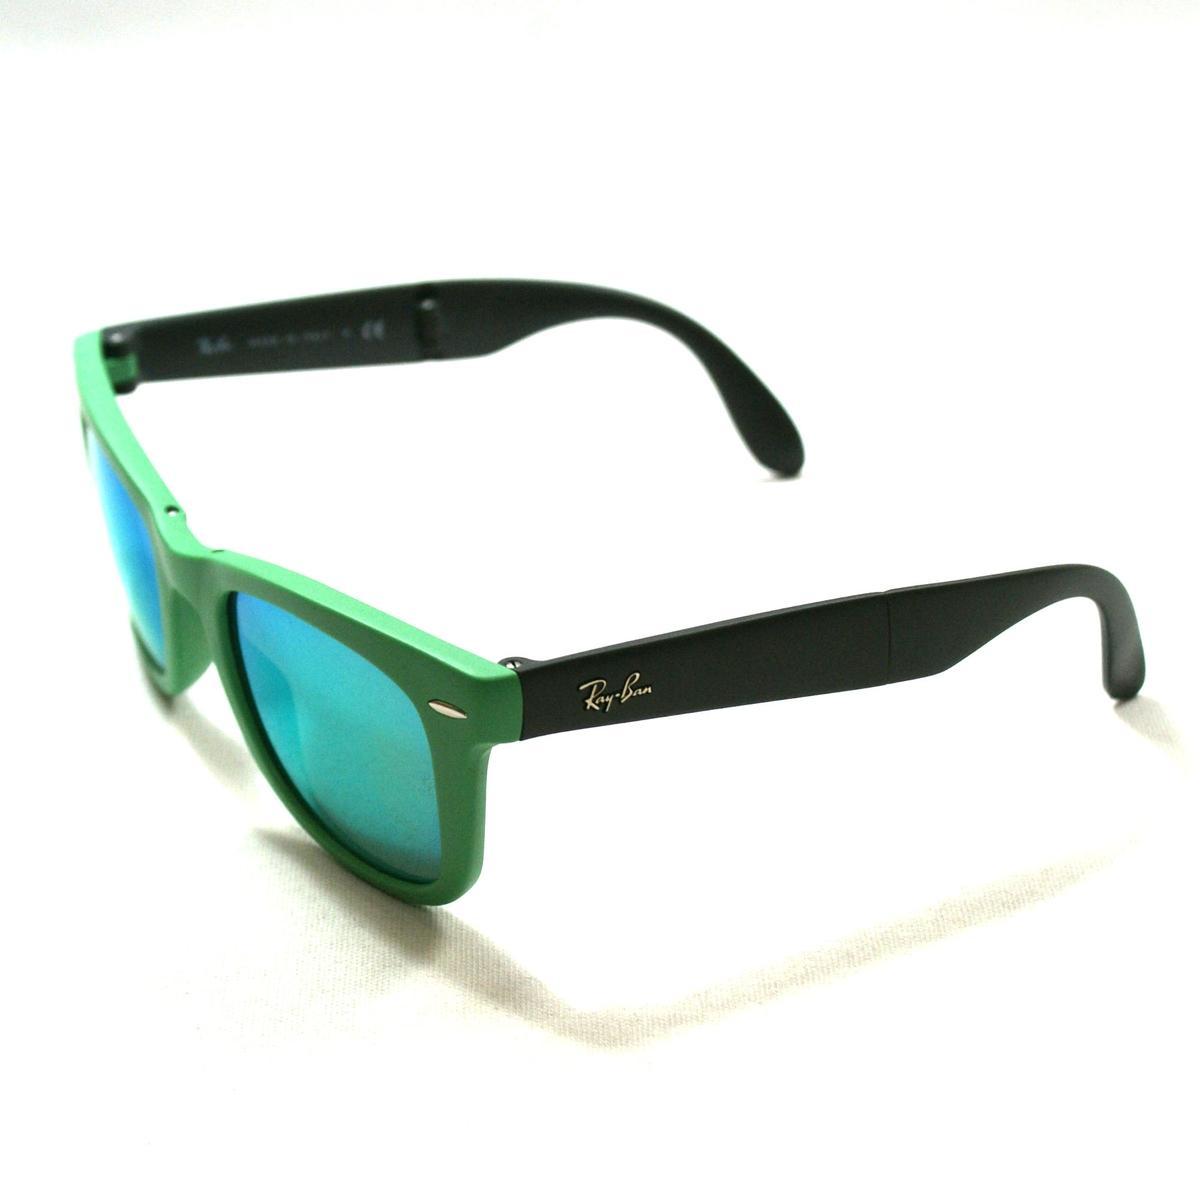 Ray Ban Folding Wayfarer Matte Green Sunglasses #RB4105